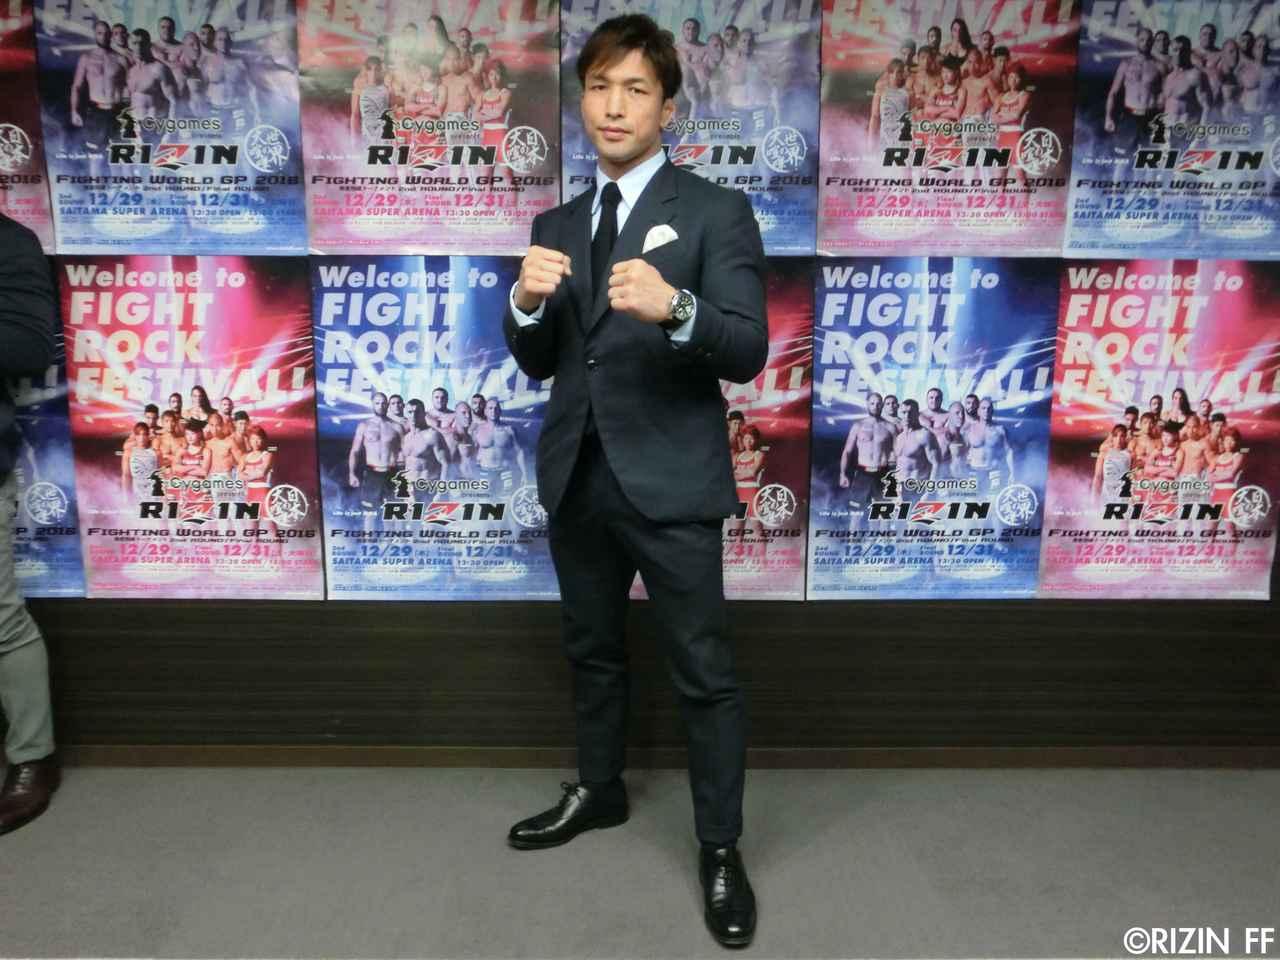 画像2: 追加カード決定! 北岡 悟、RIZIN初参戦!!